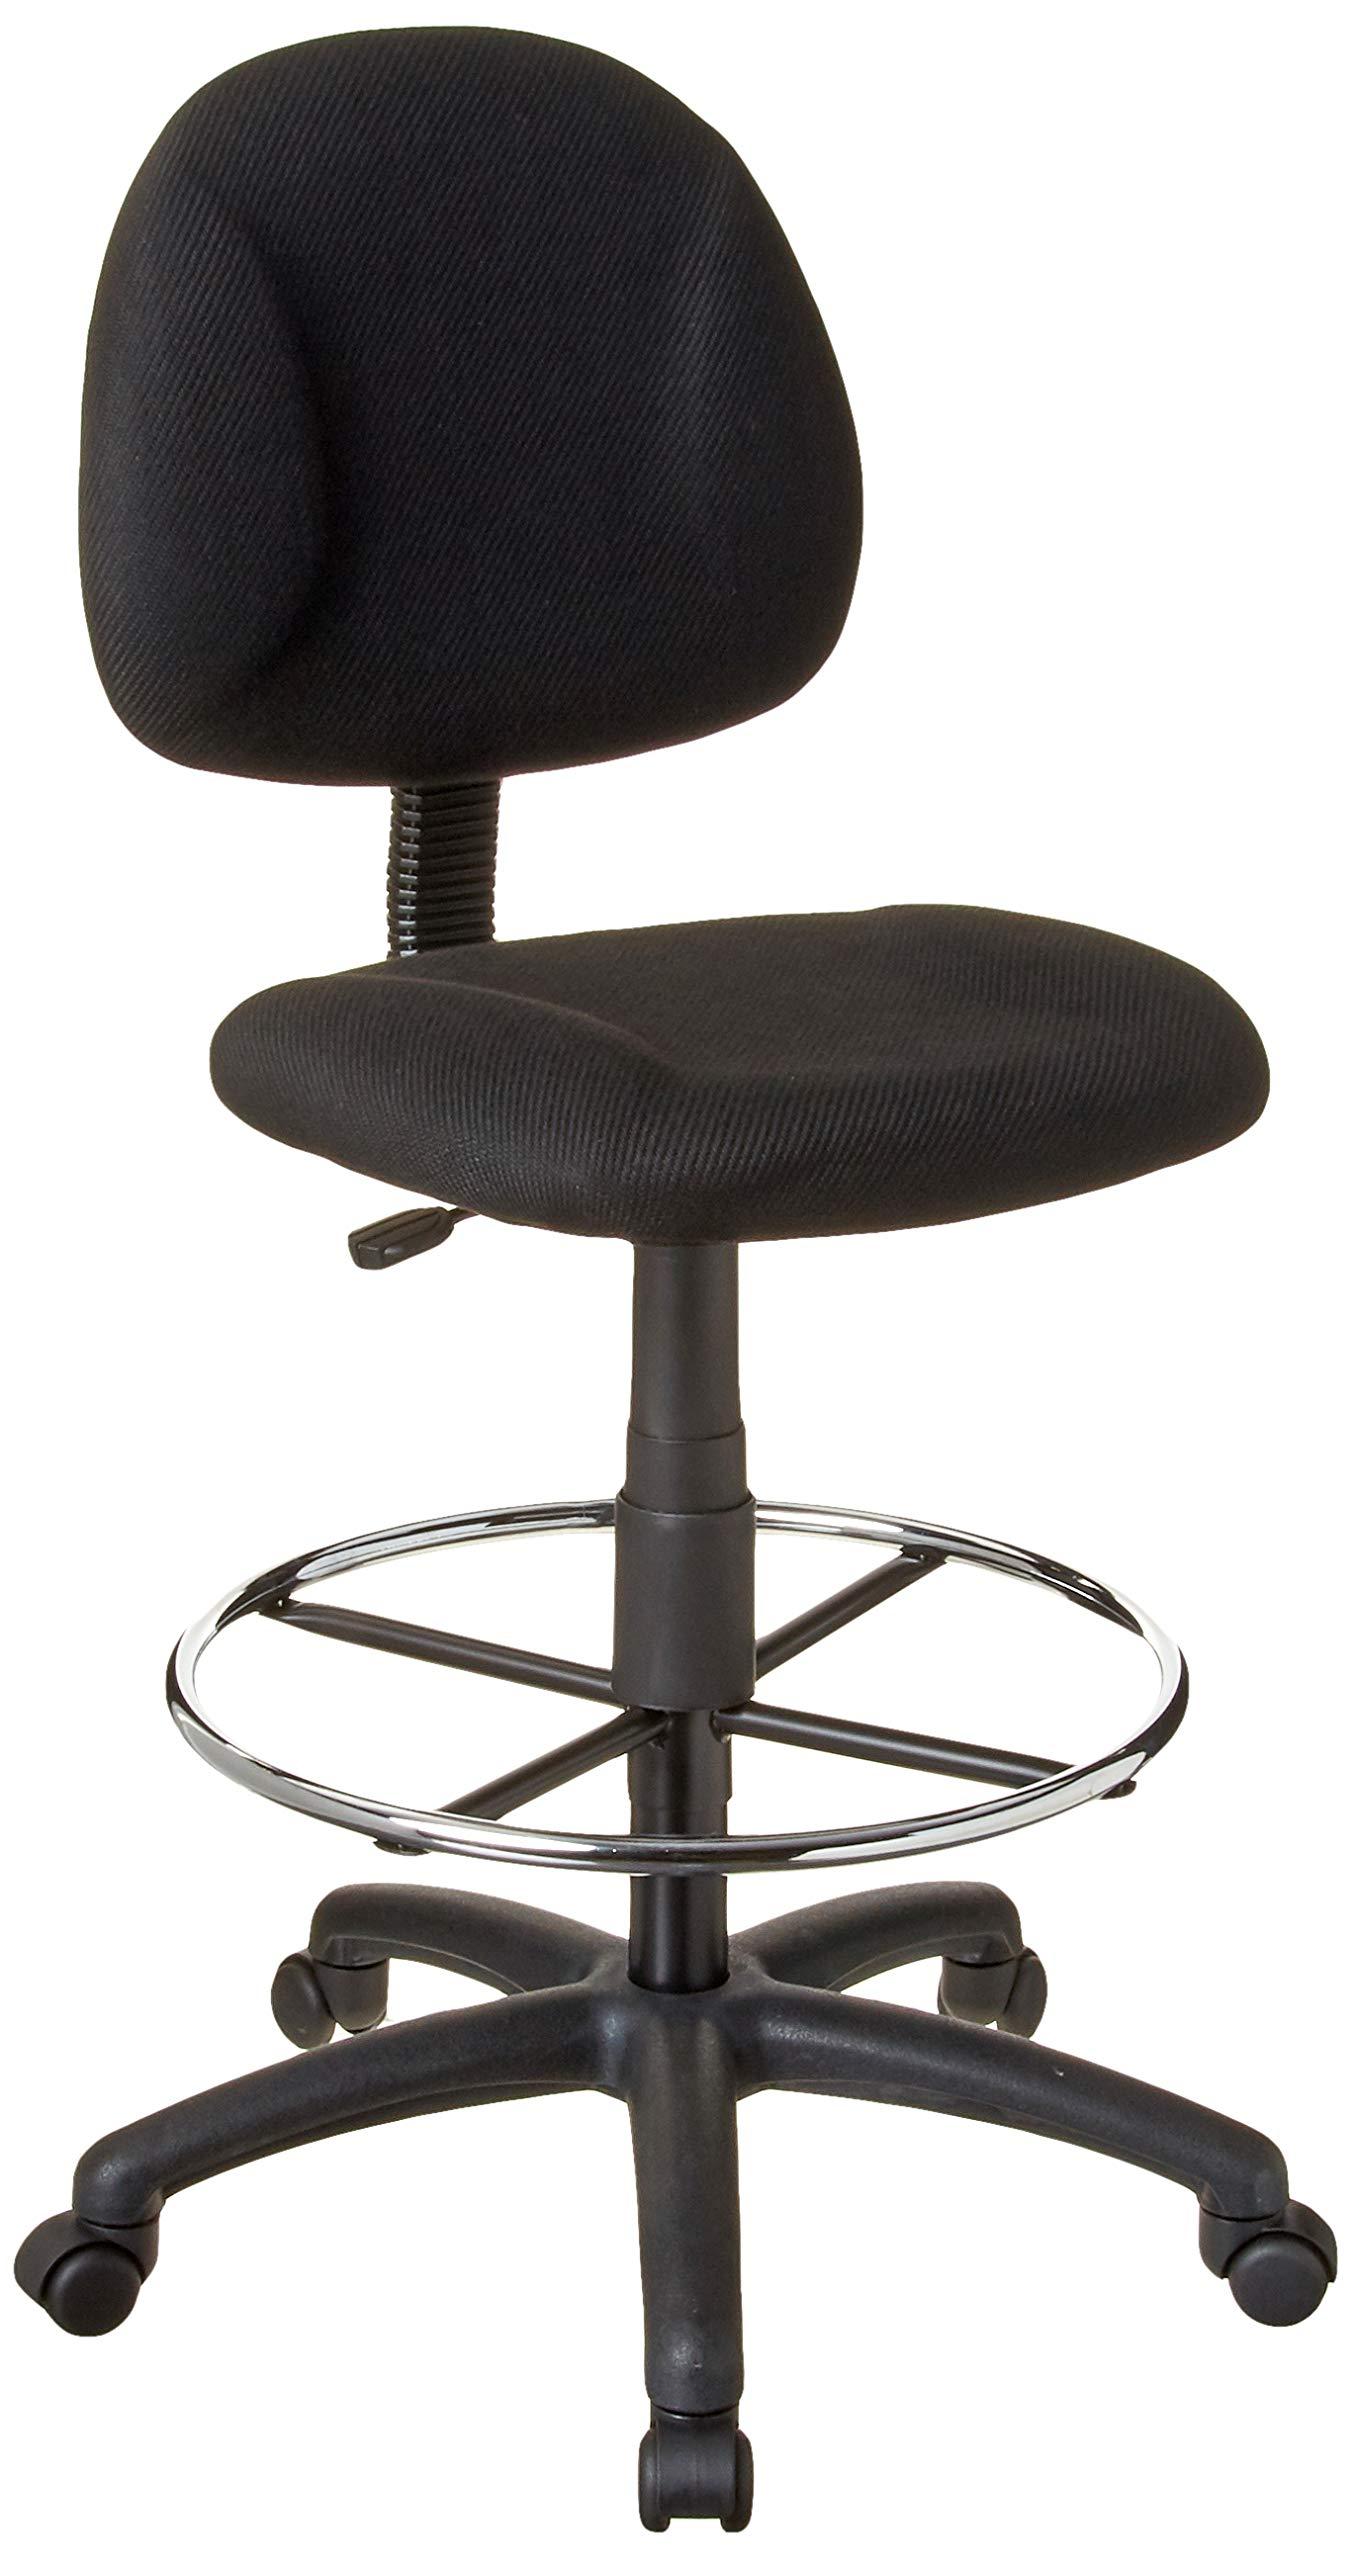 Boss Office Products B1615 BK Ergonomic